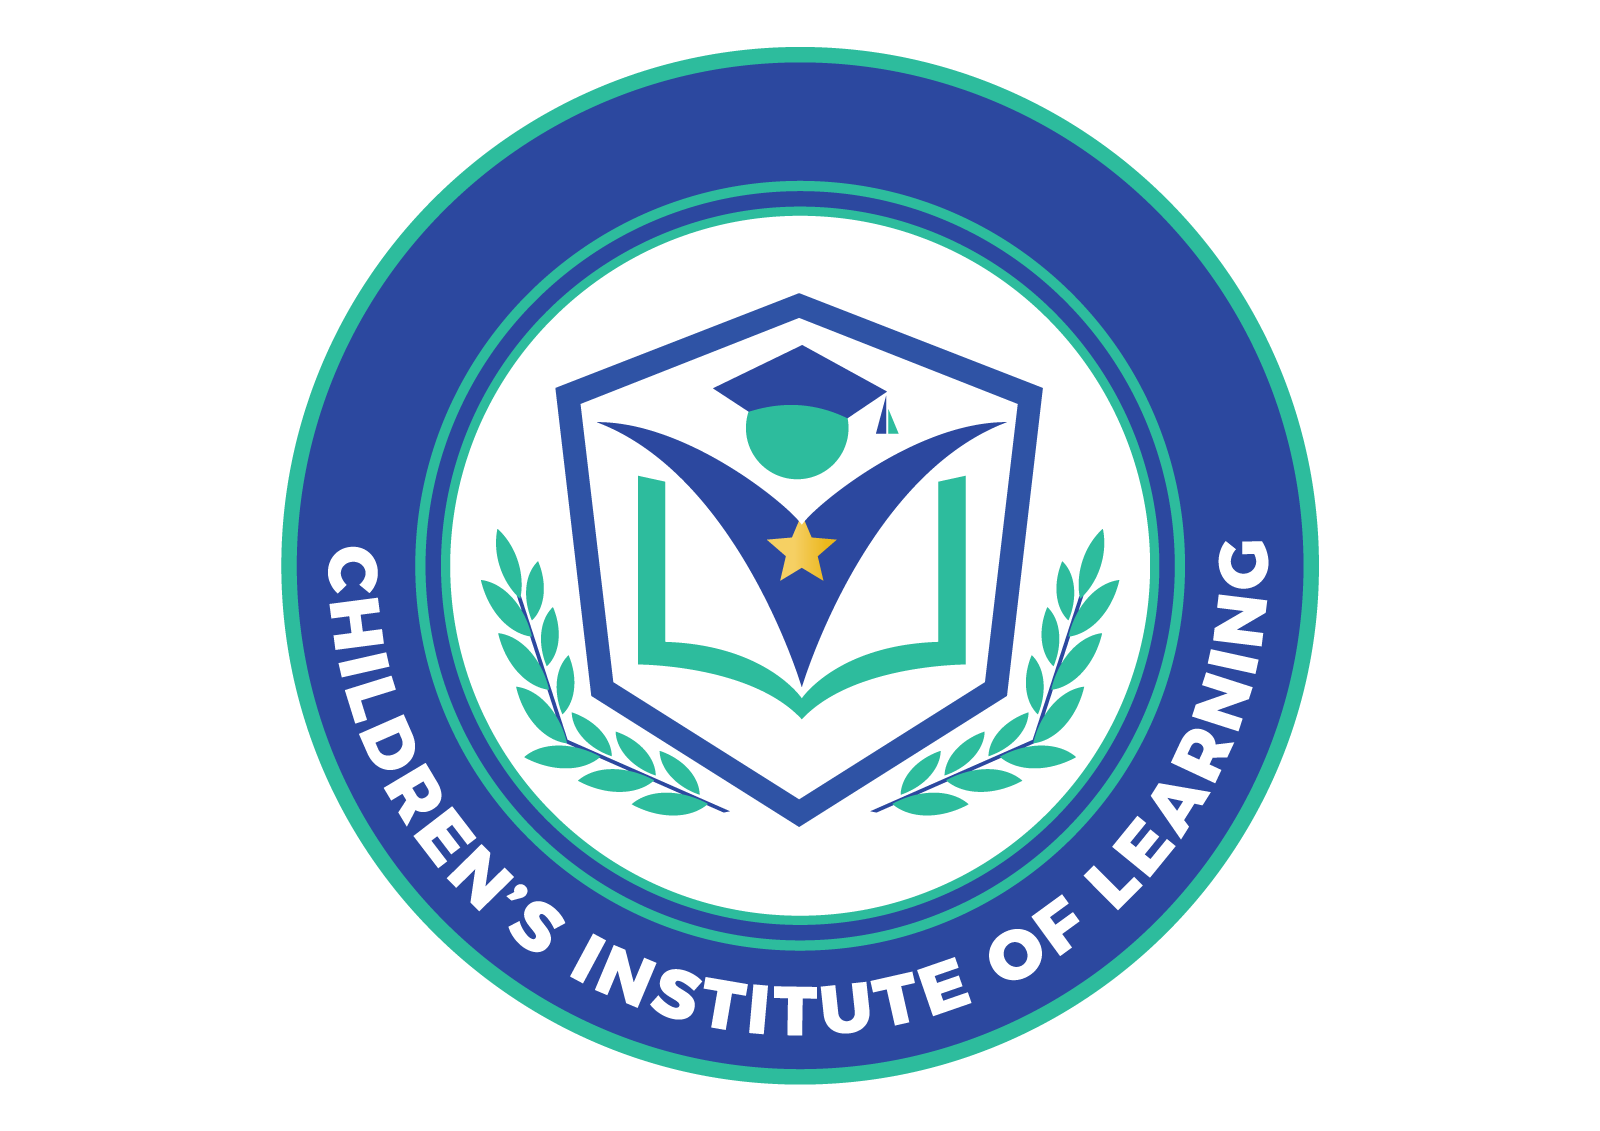 Children's Institute of Learning